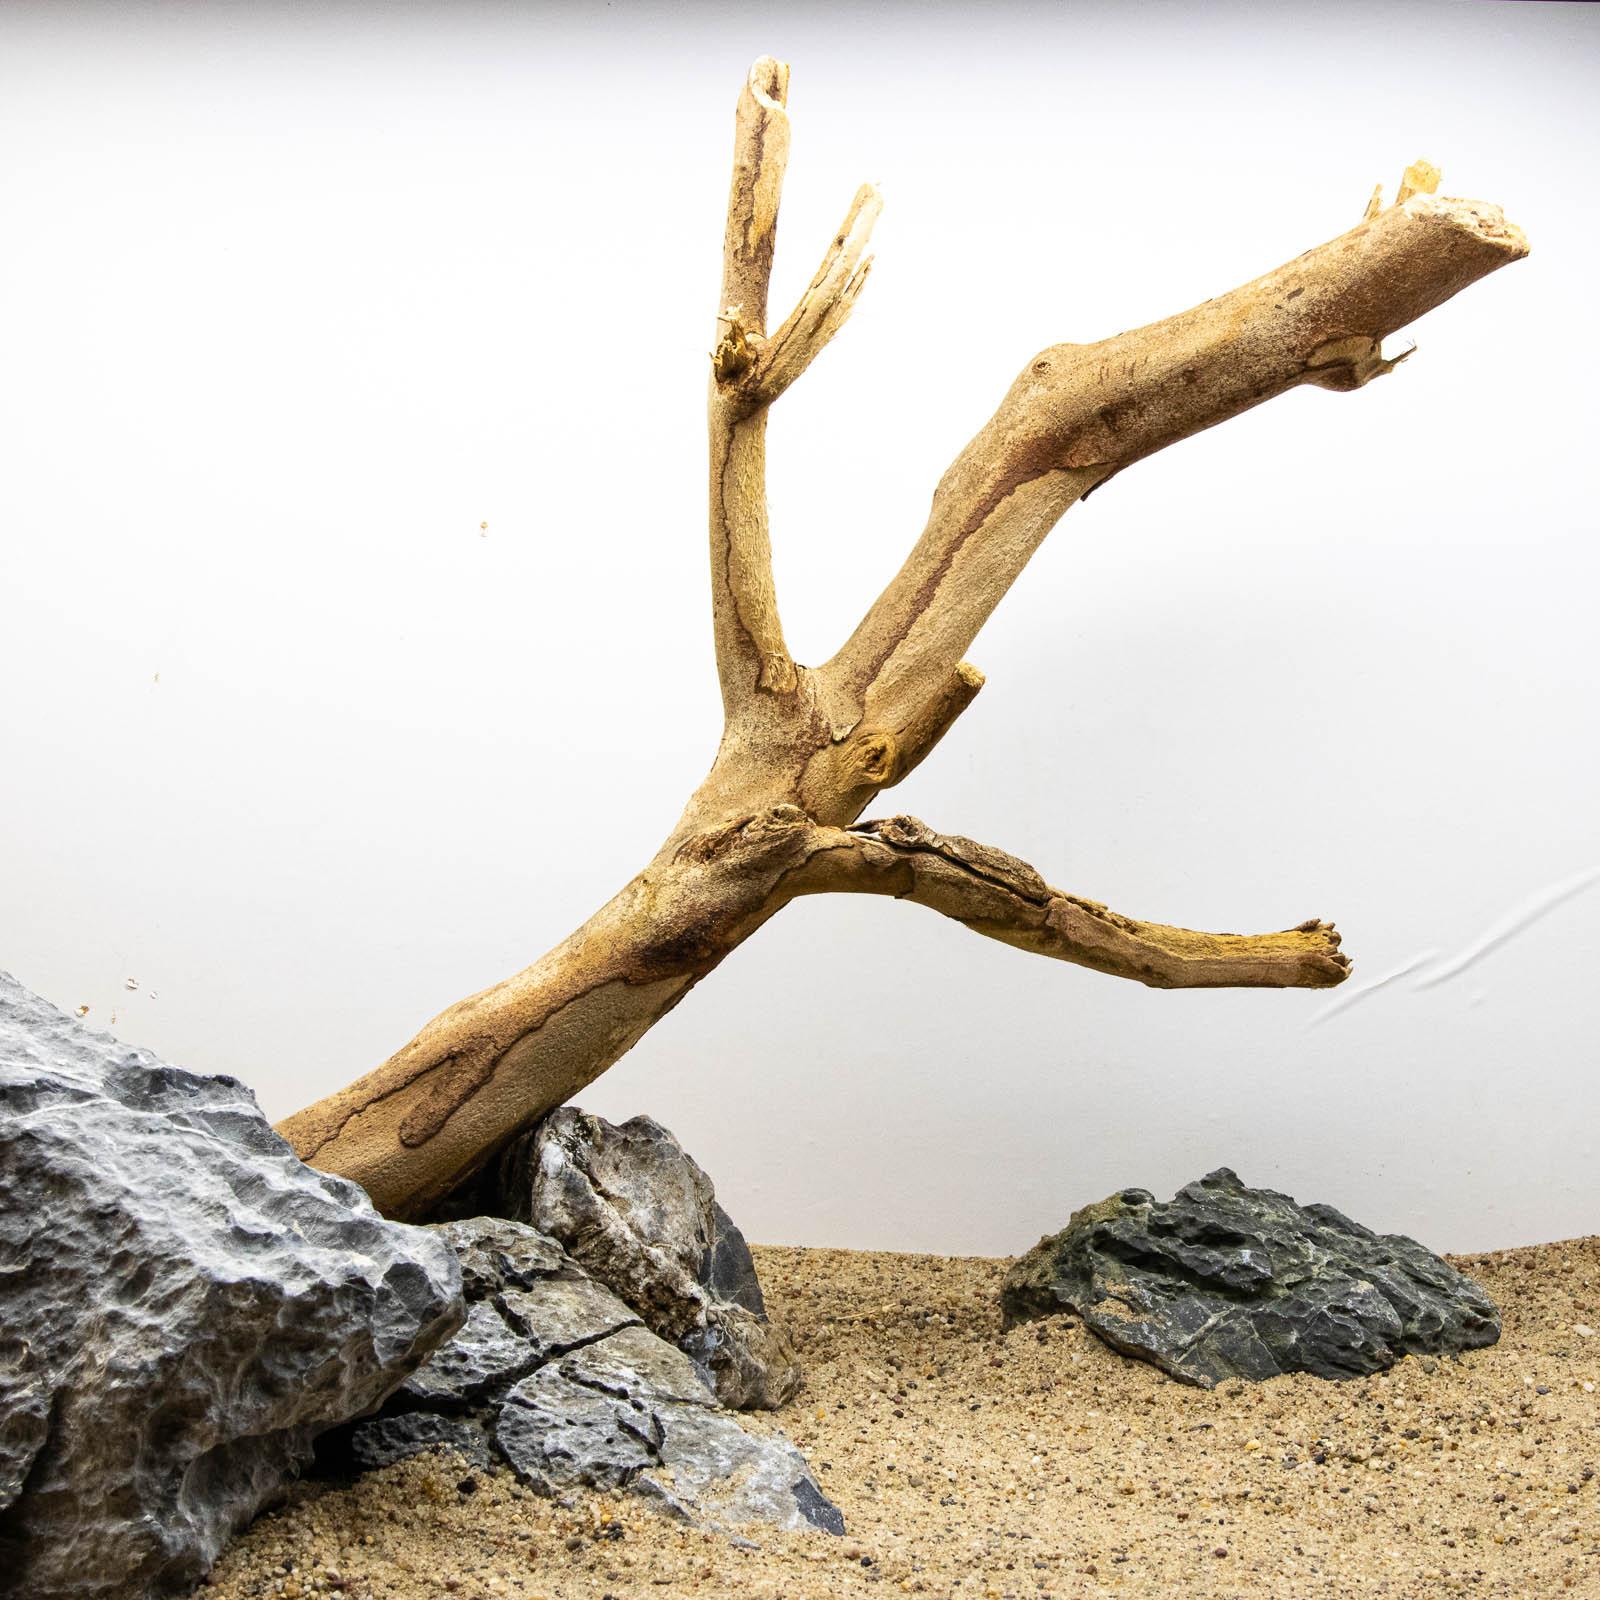 Talawa Holz mit Steinen beschwert